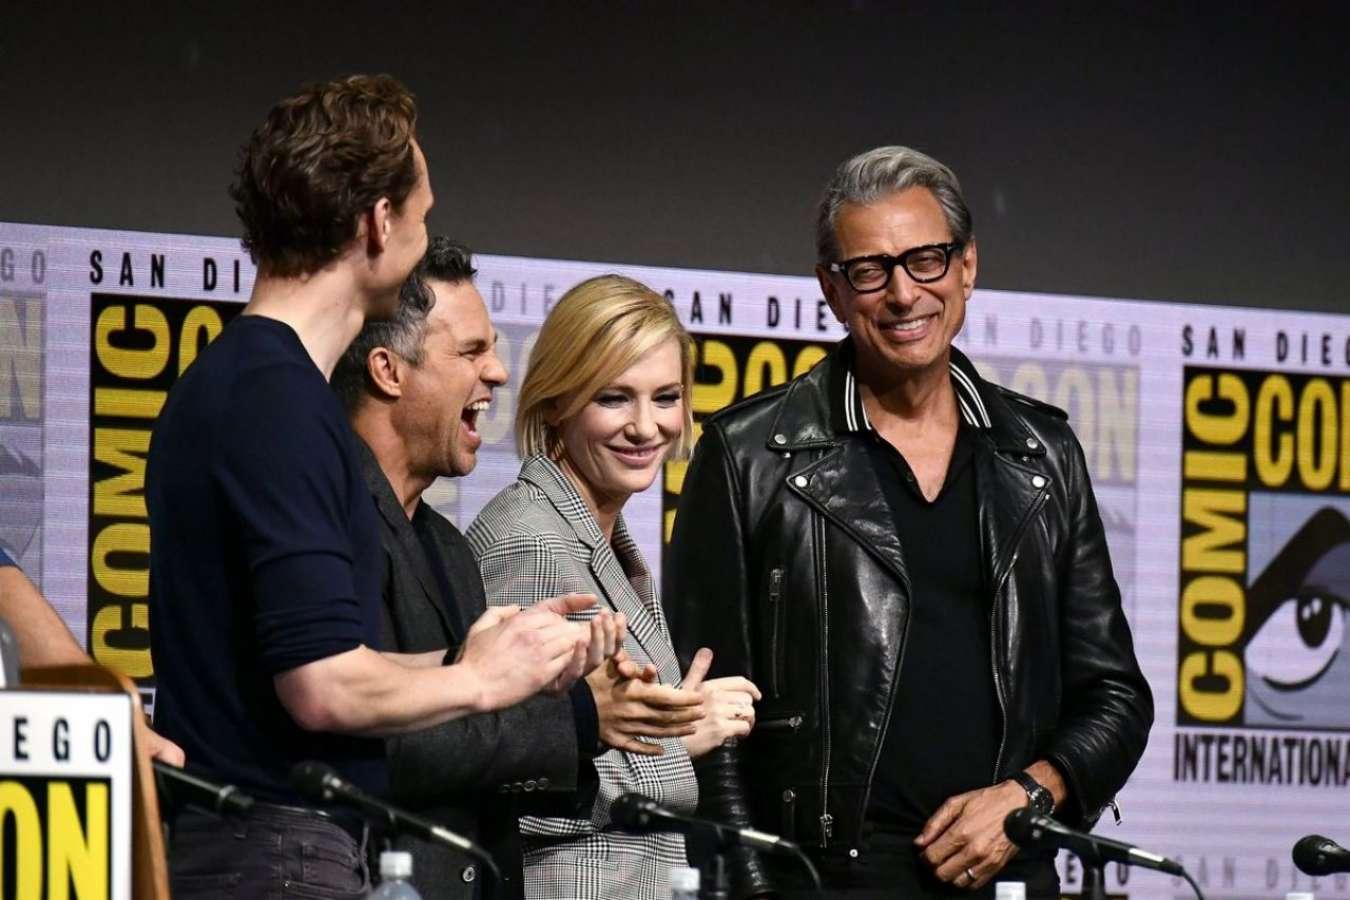 Cate Blanchett 2017 : Cate Blanchett: Marvel Studios Panel at San Diego Comic-Con 2017-05